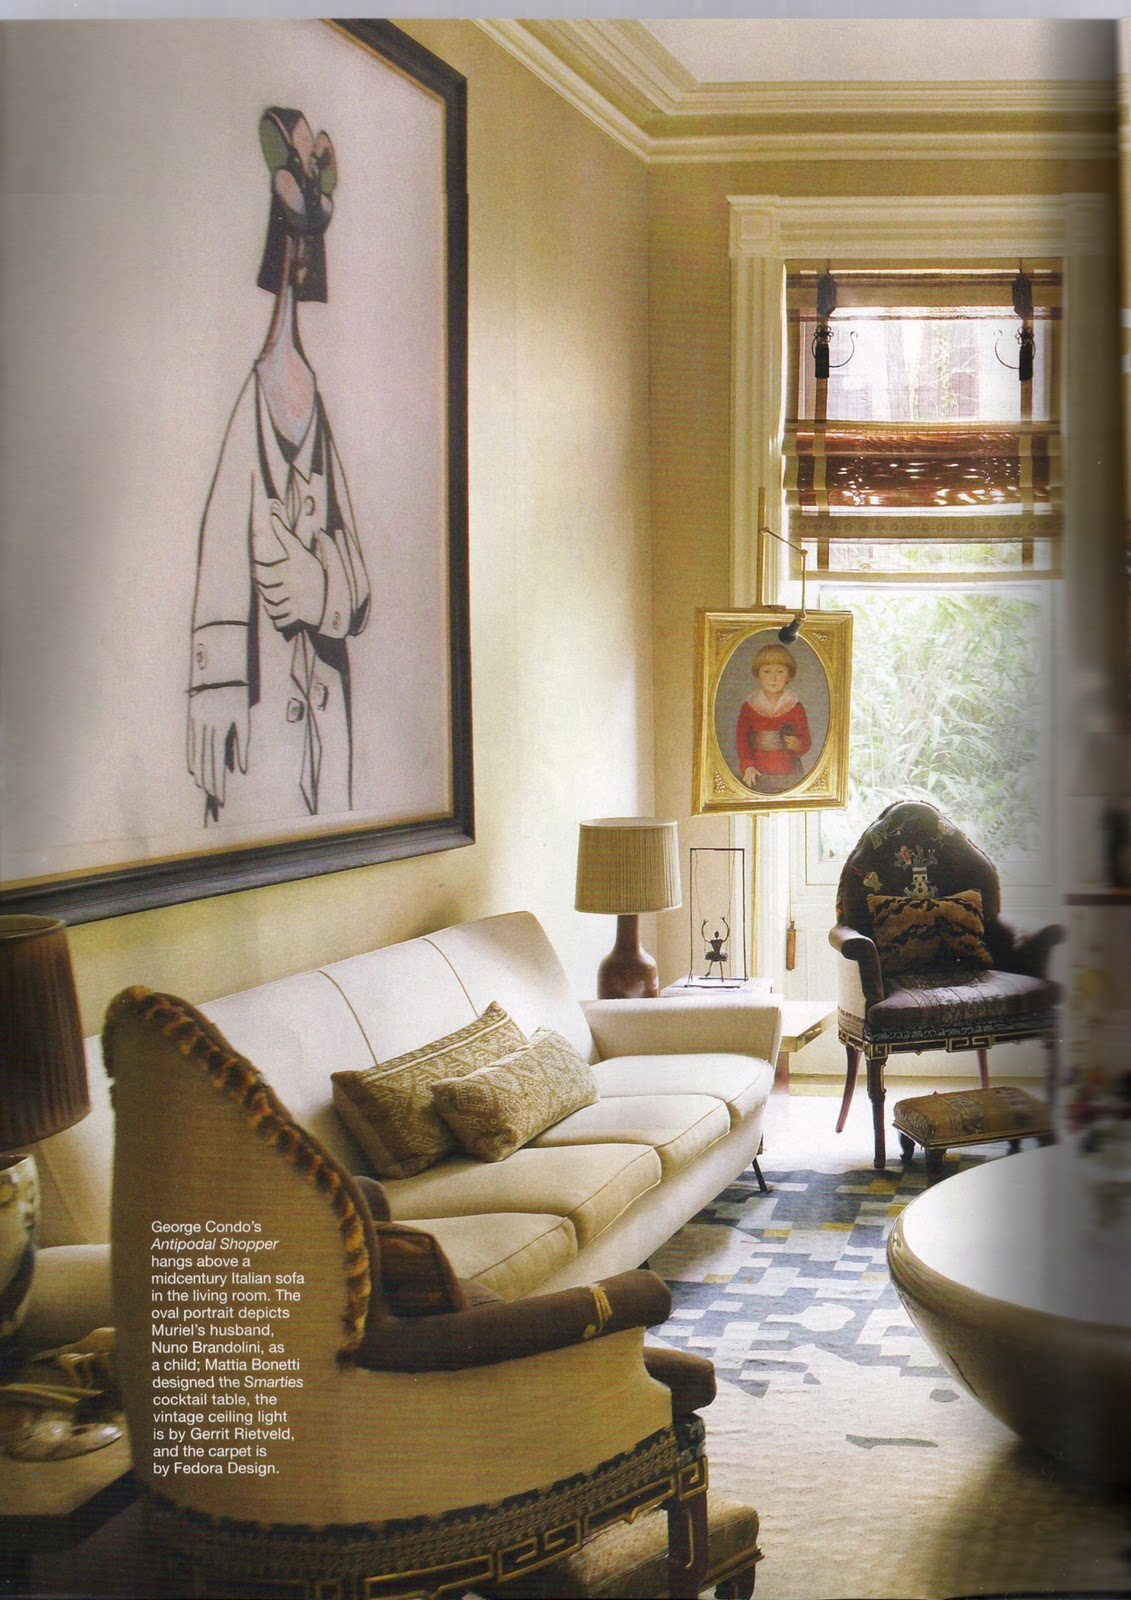 Interior Design Of Living Room With Balcony: US Interior Designs: MURIEL BRANDOLINI